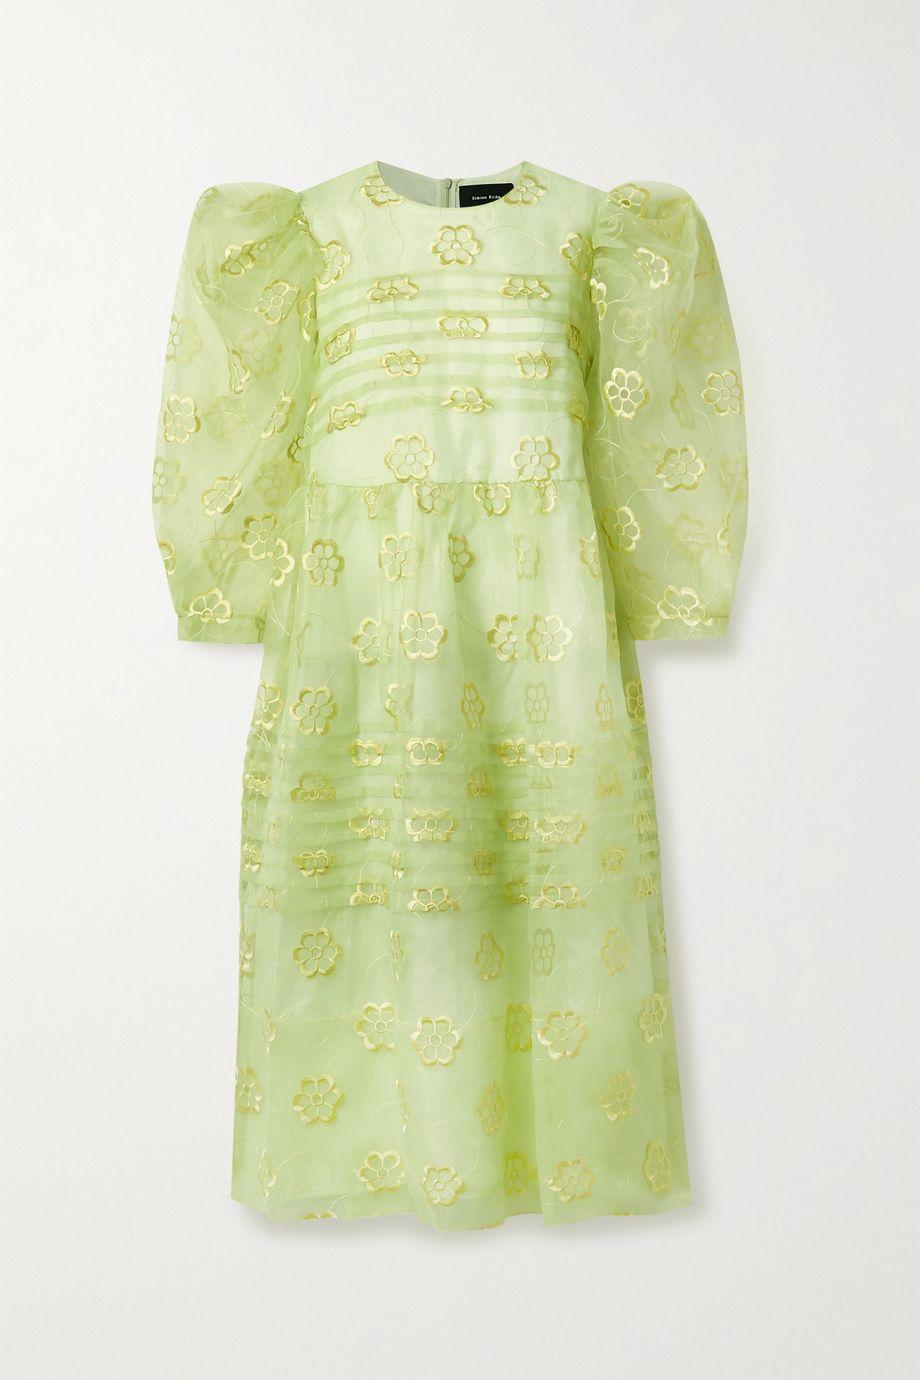 Simone Rocha Pintucked floral-embroidered organza midi dress